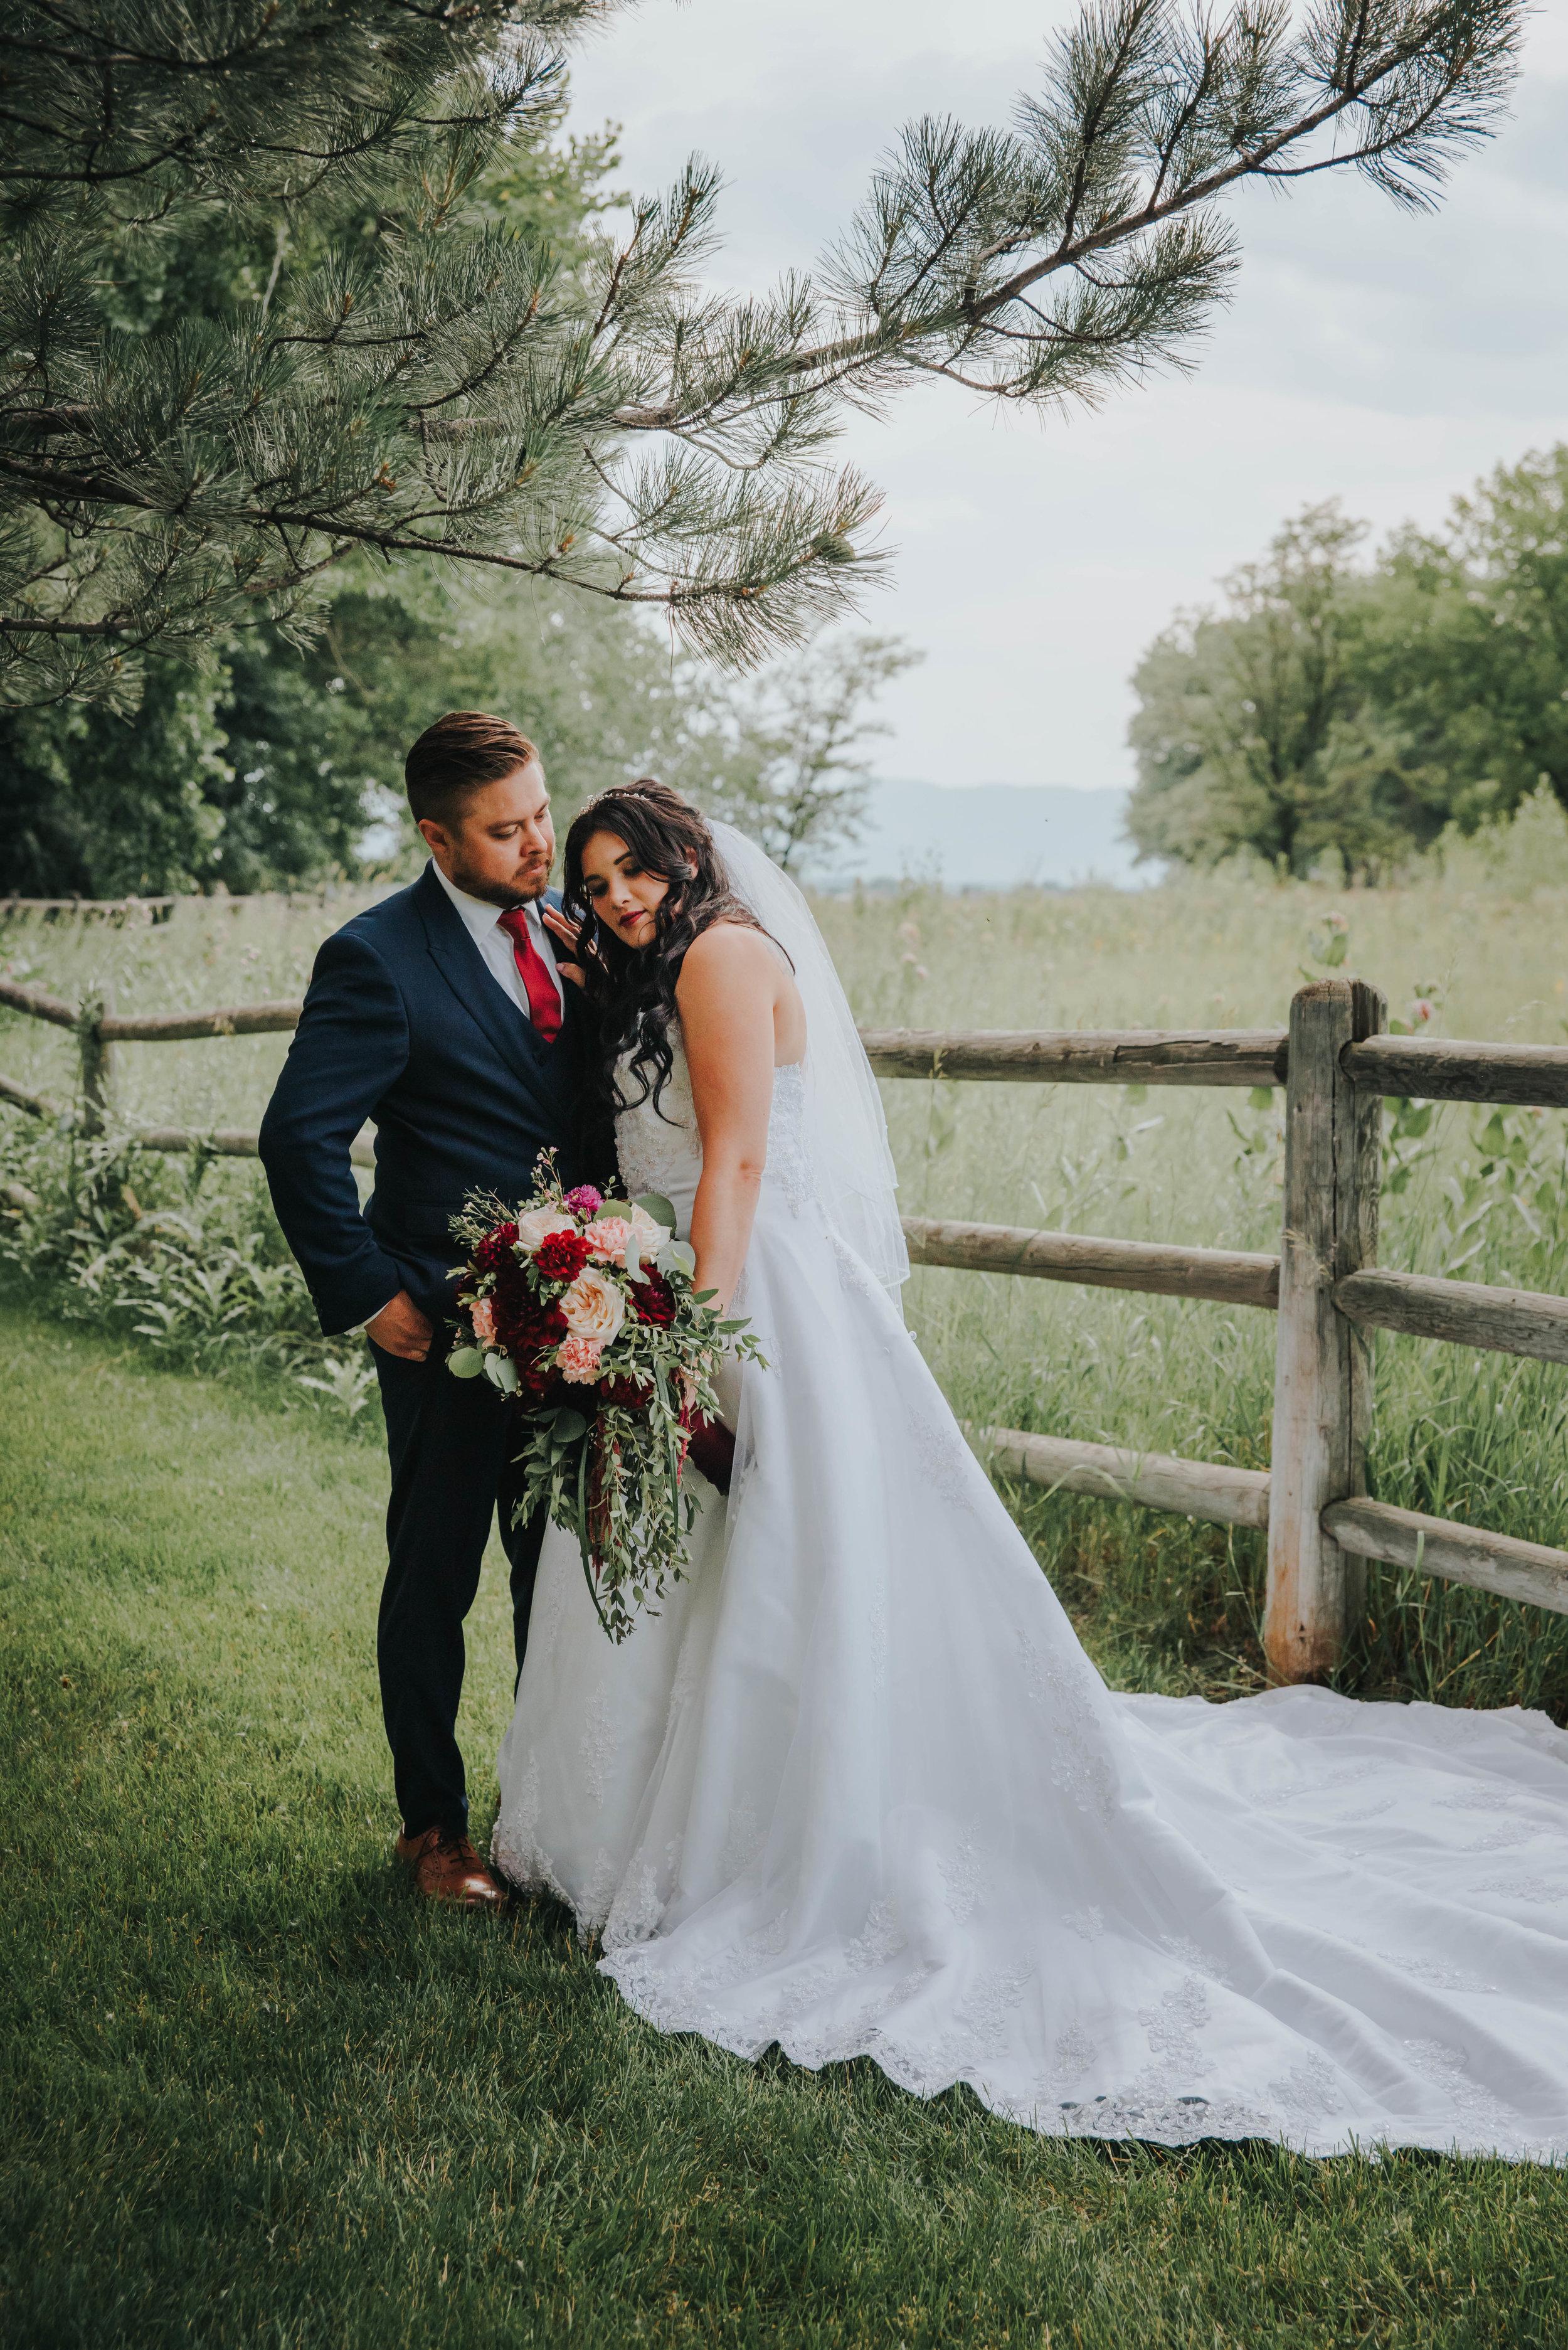 Colorado Wedding Photographer | Miss. Miller's Photography |